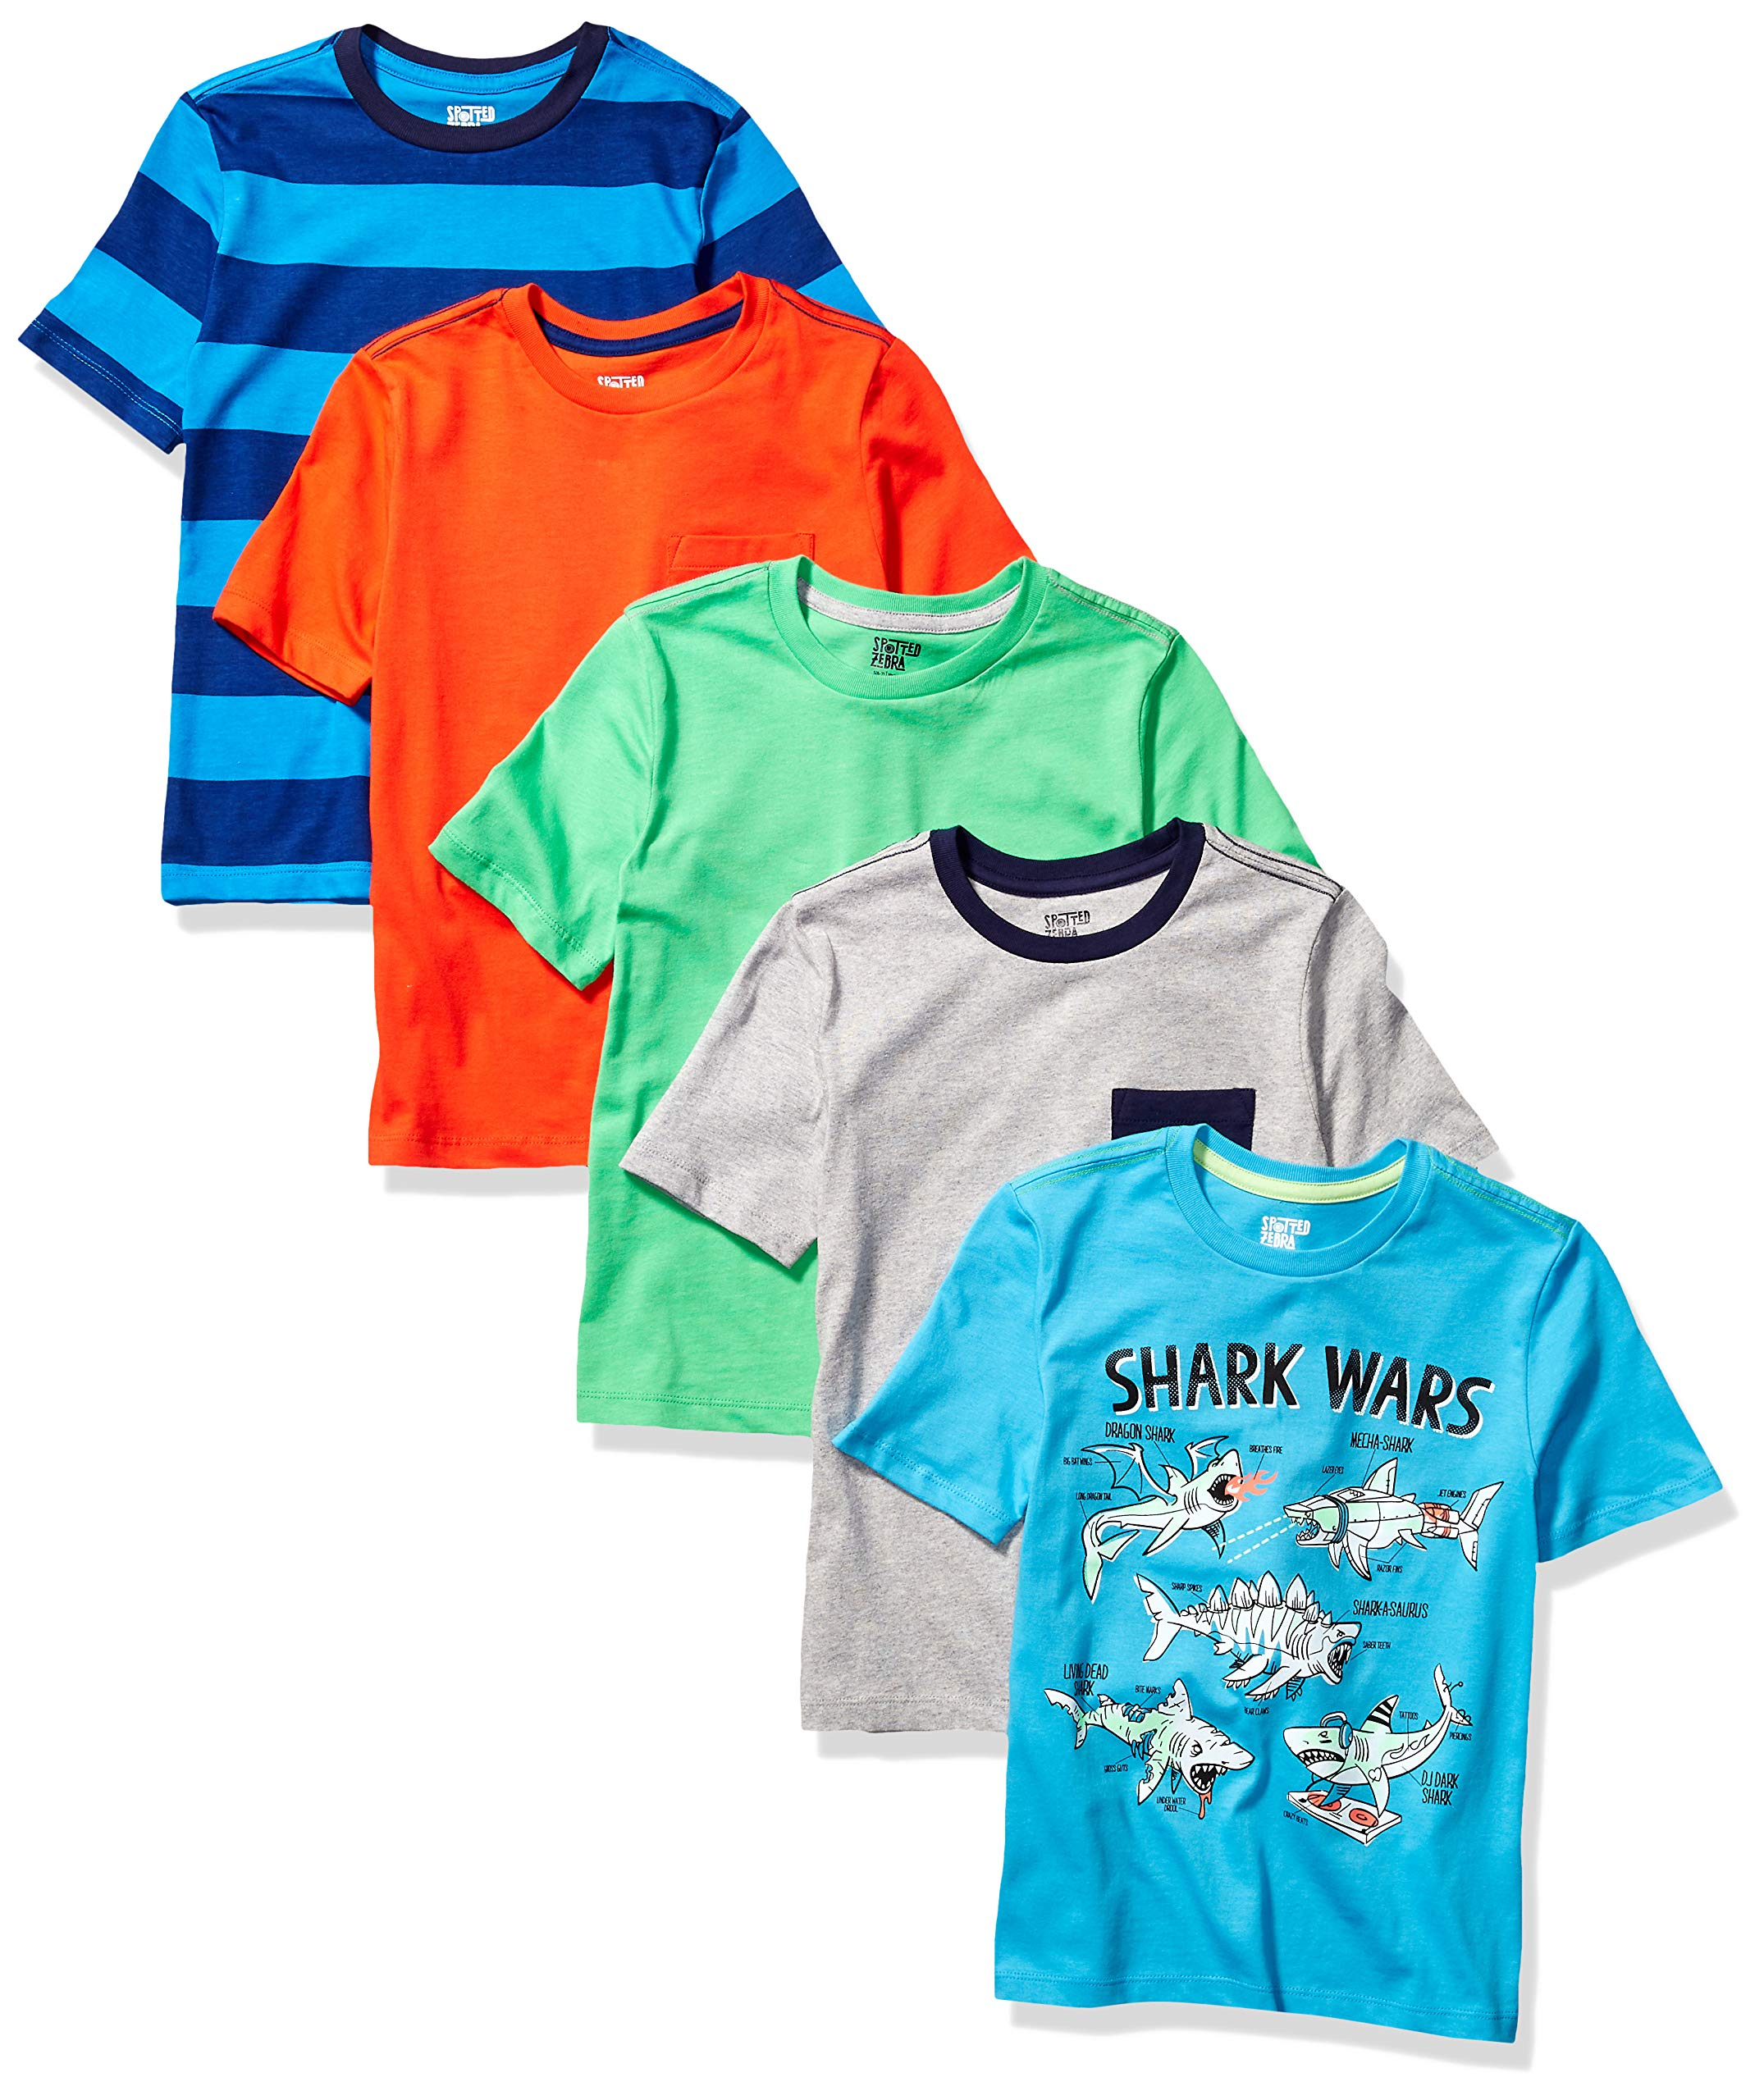 Amazon Brand - Spotted Zebra Boy's Kid 5-Pack Short-Sleeve T-Shirts, Shark Wars, XX-Large (14) by Spotted Zebra